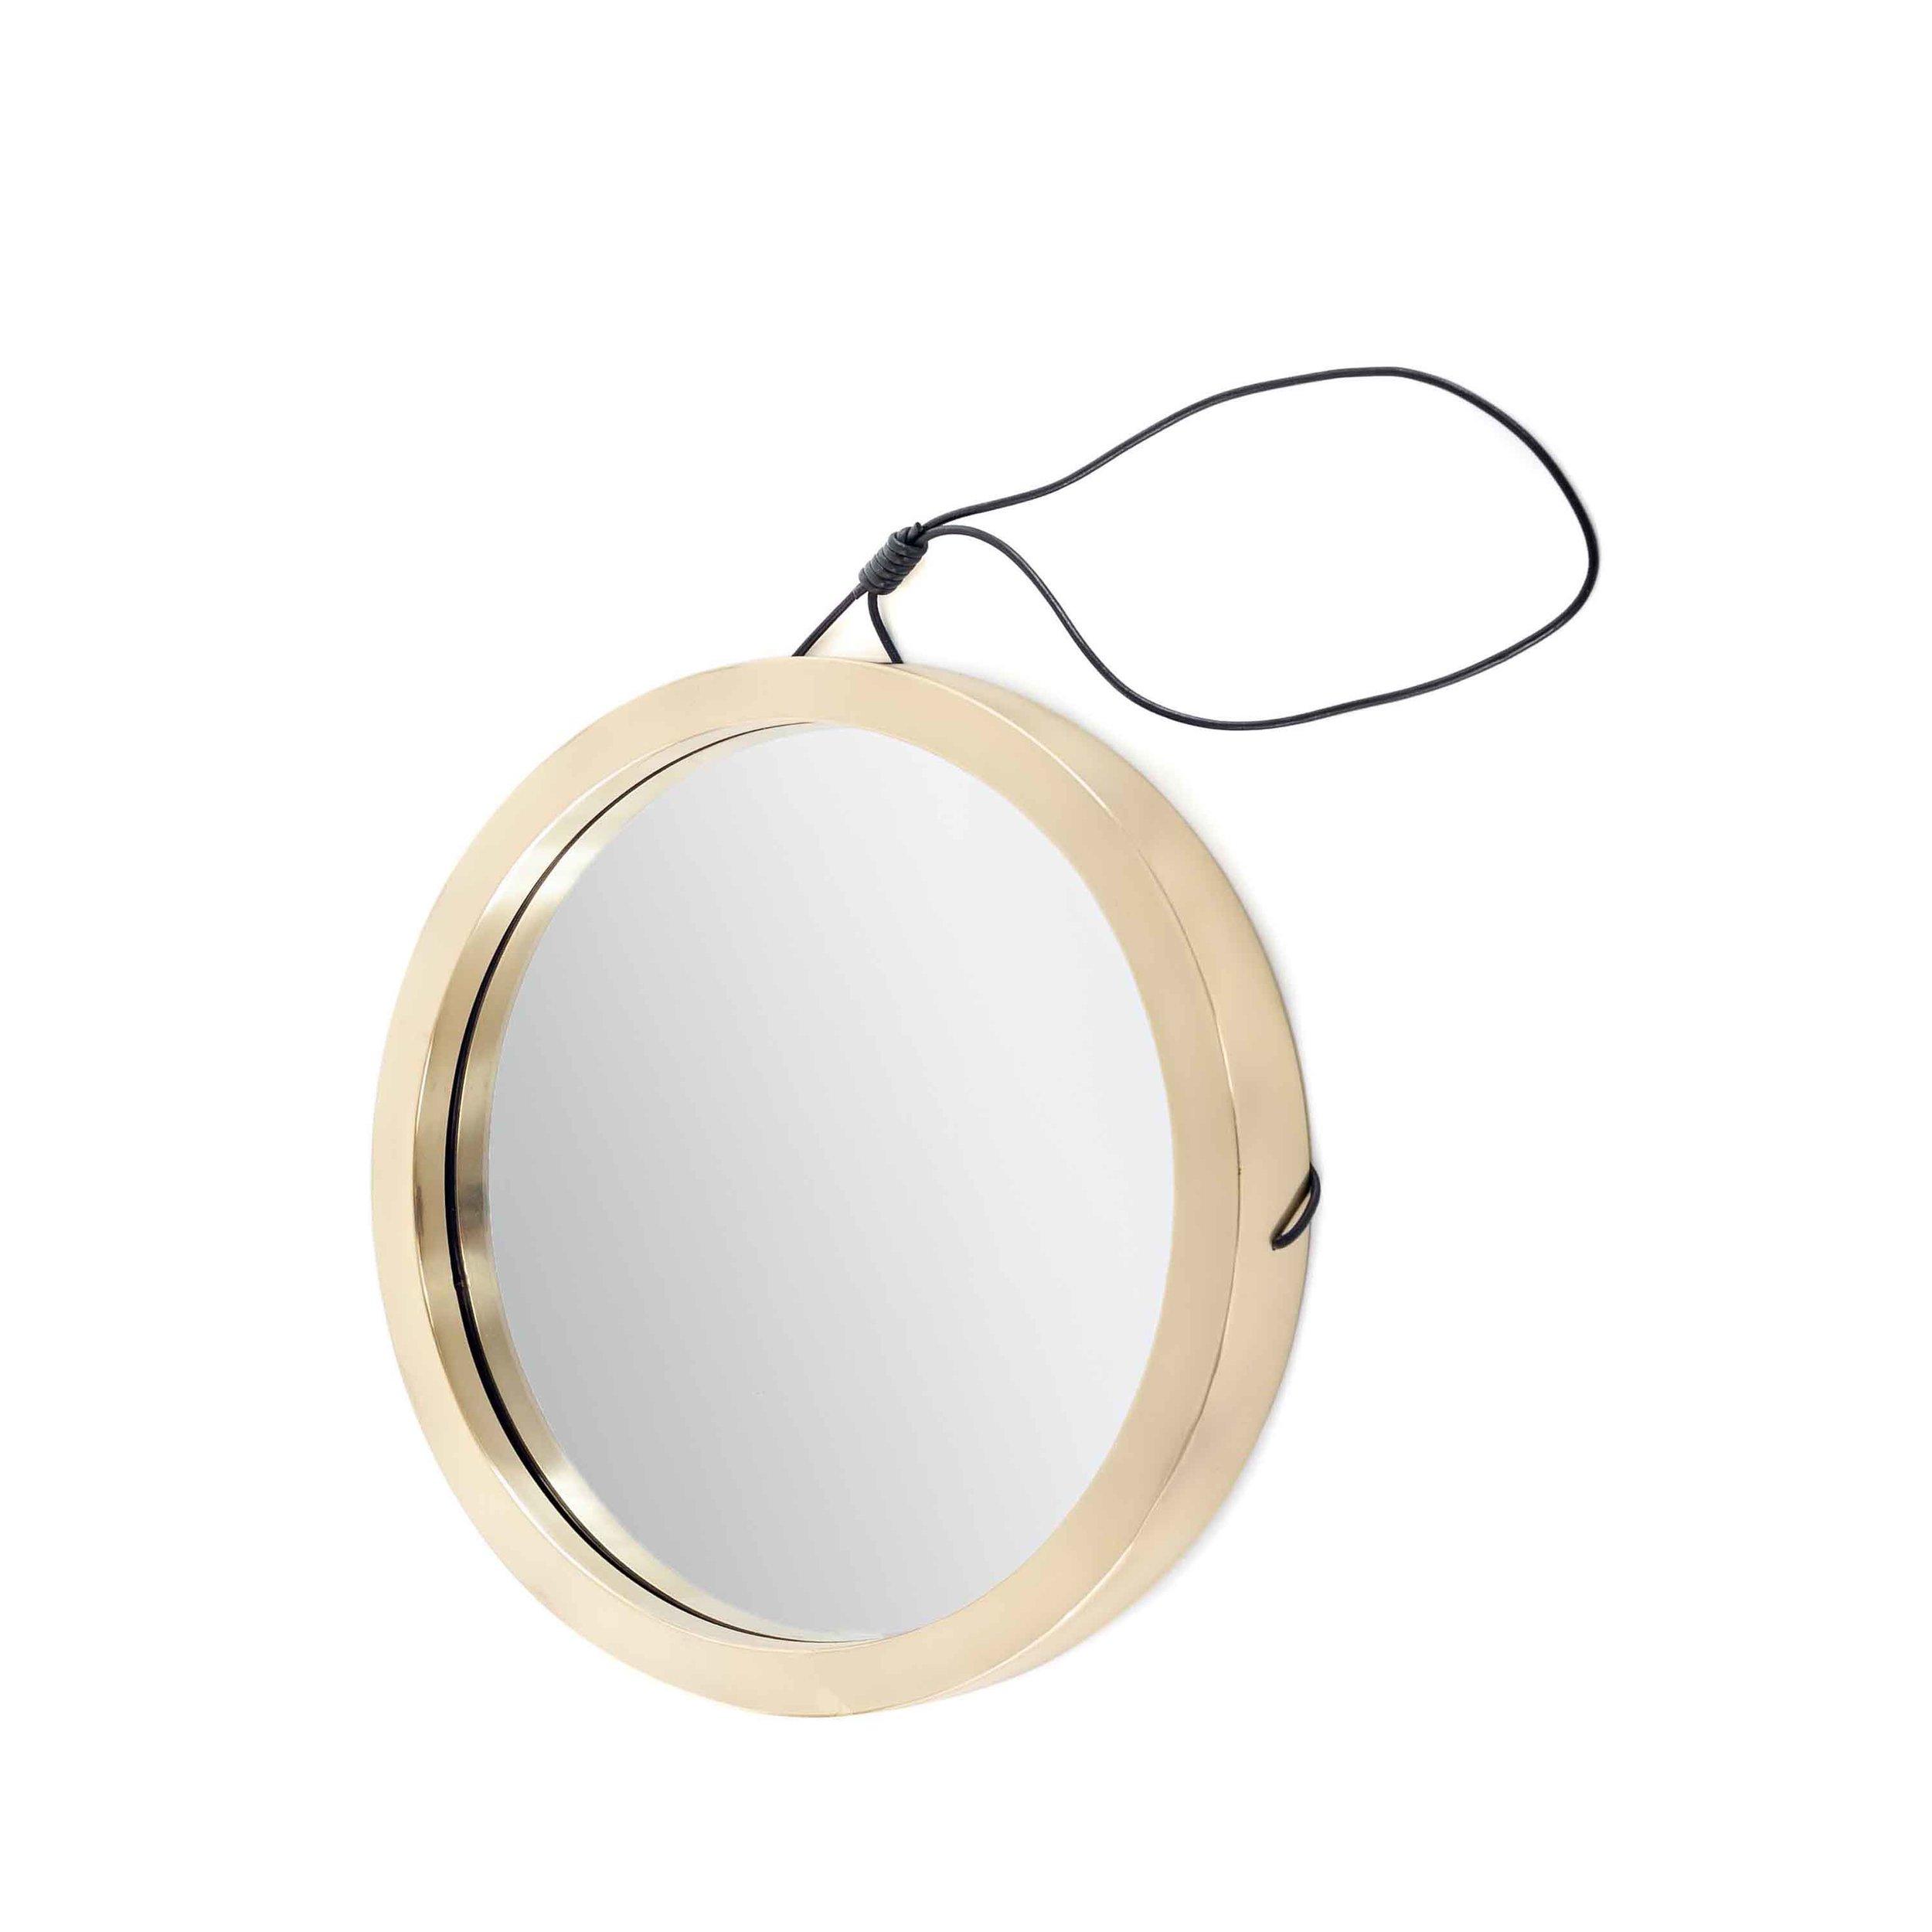 Dandy Mirror Brass_lowres.jpg